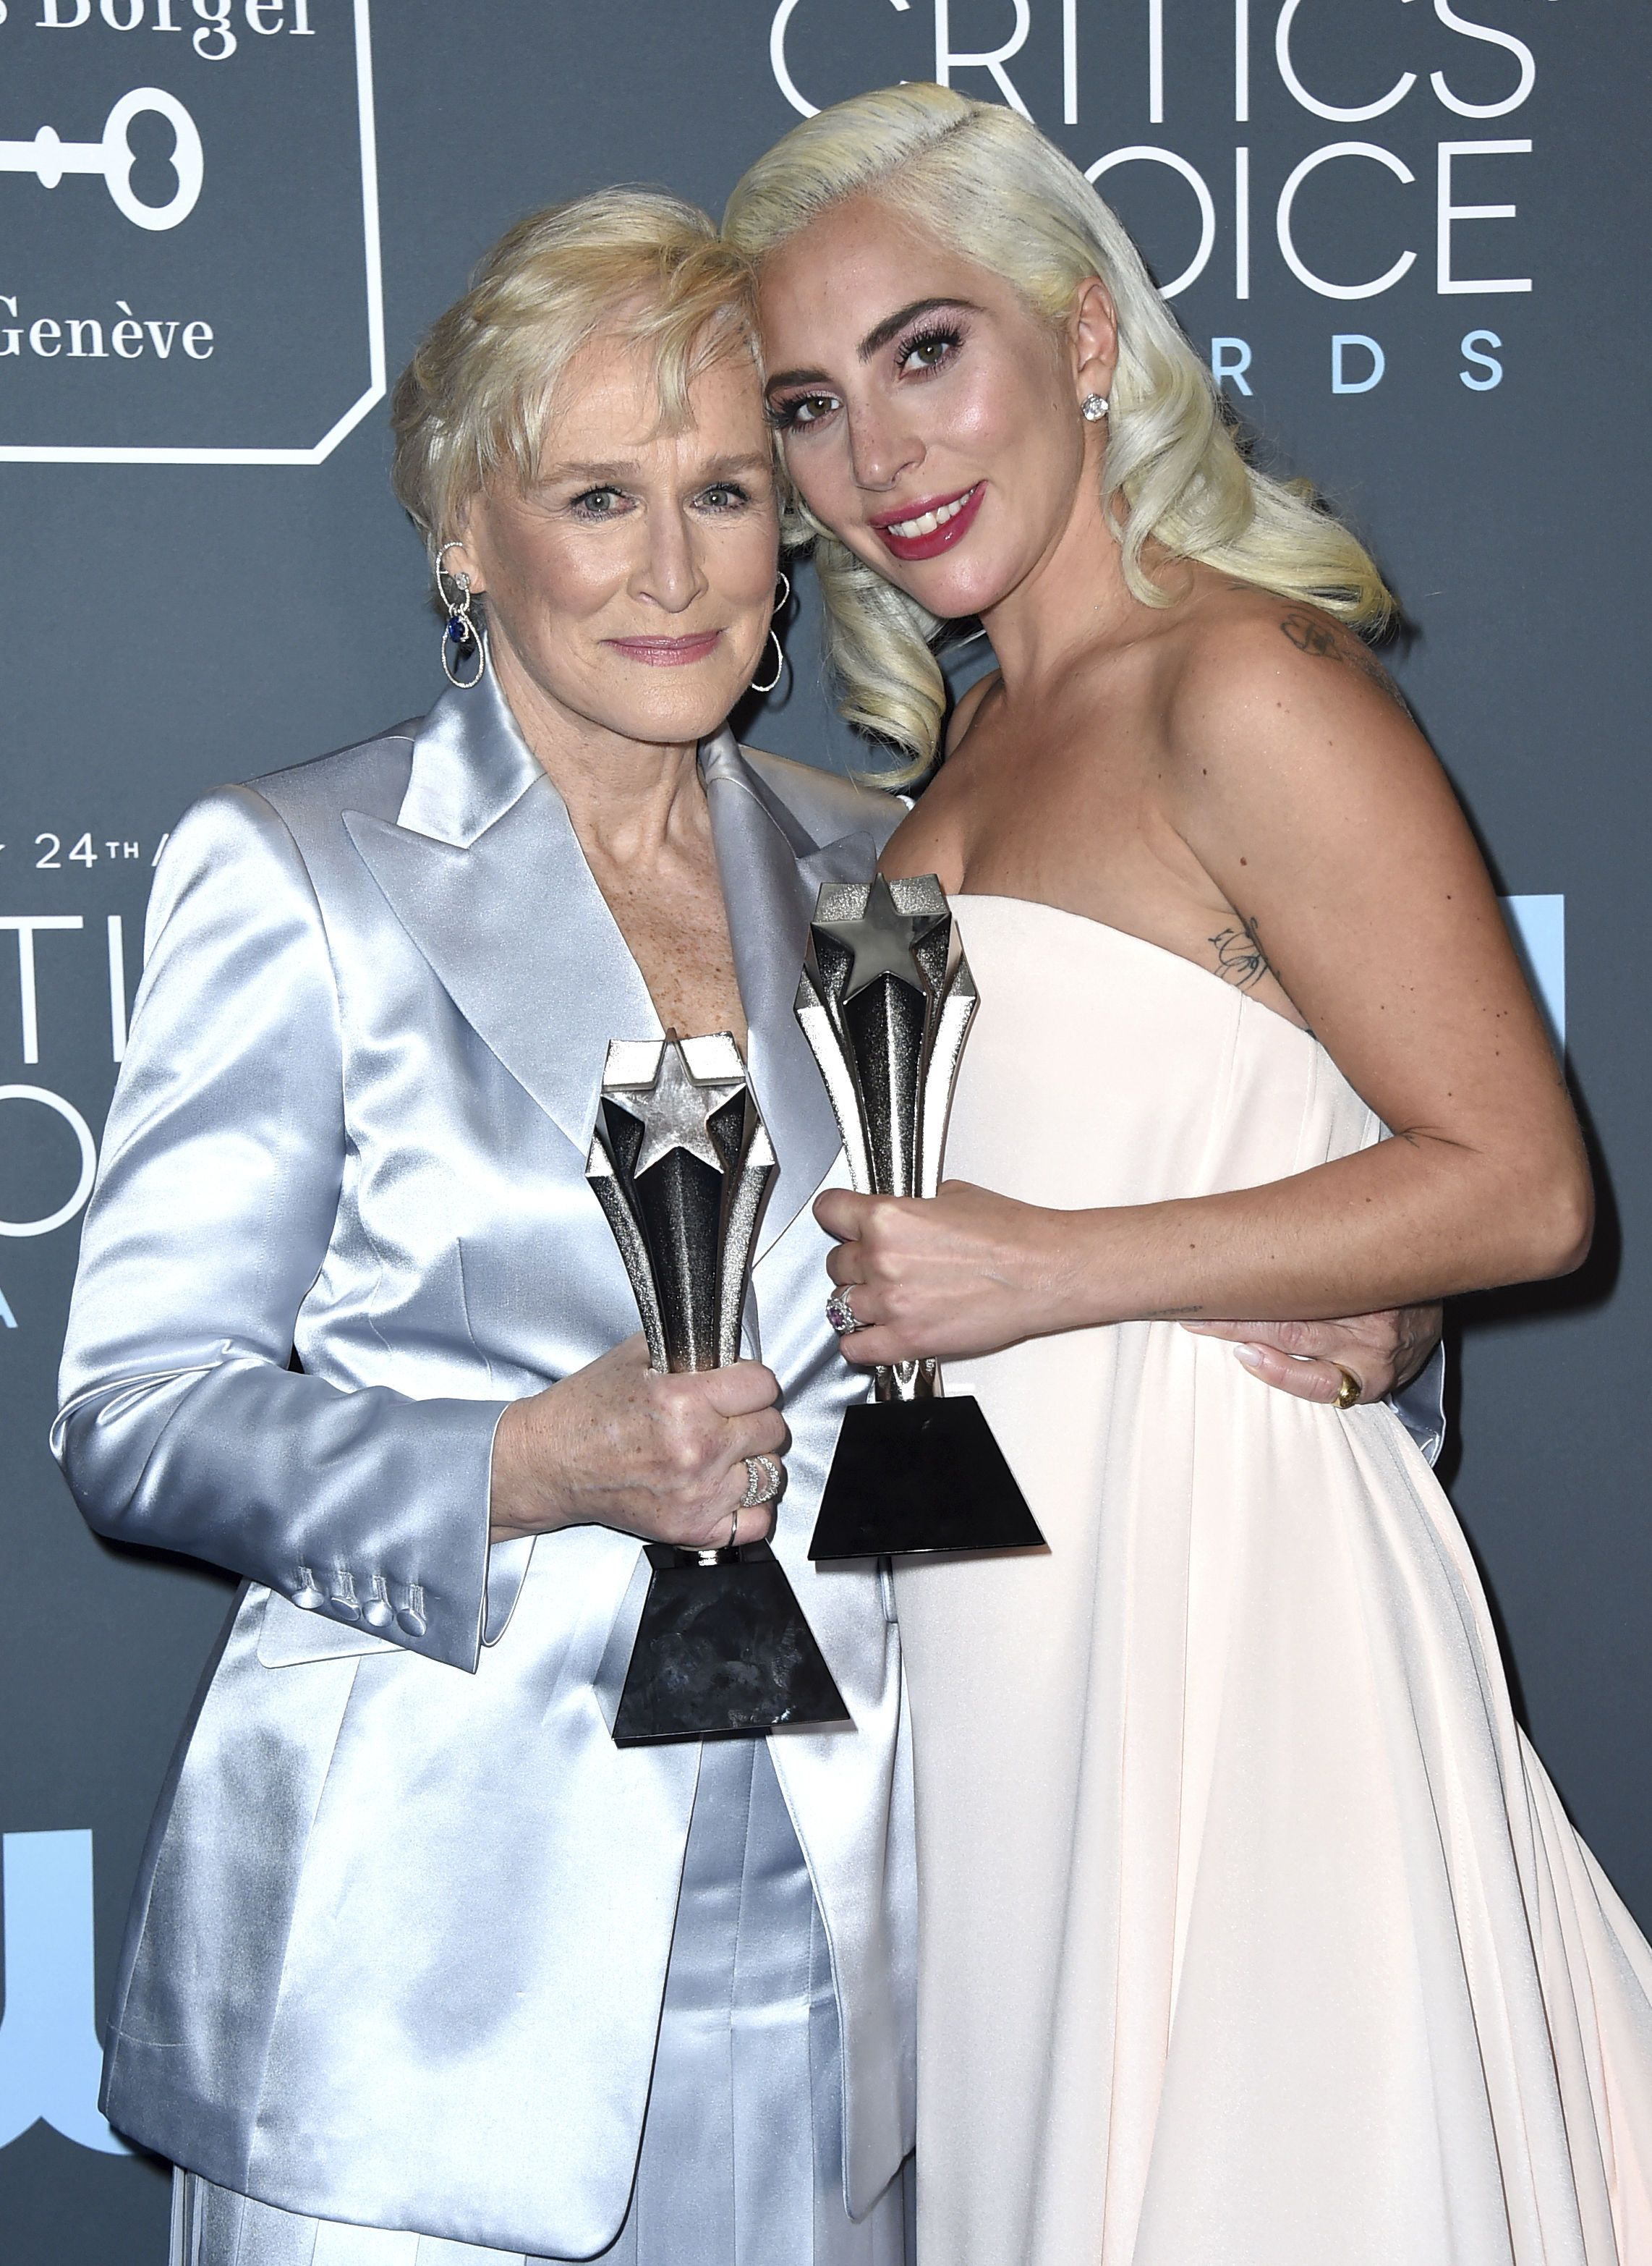 Critics 'Choice Awards_25